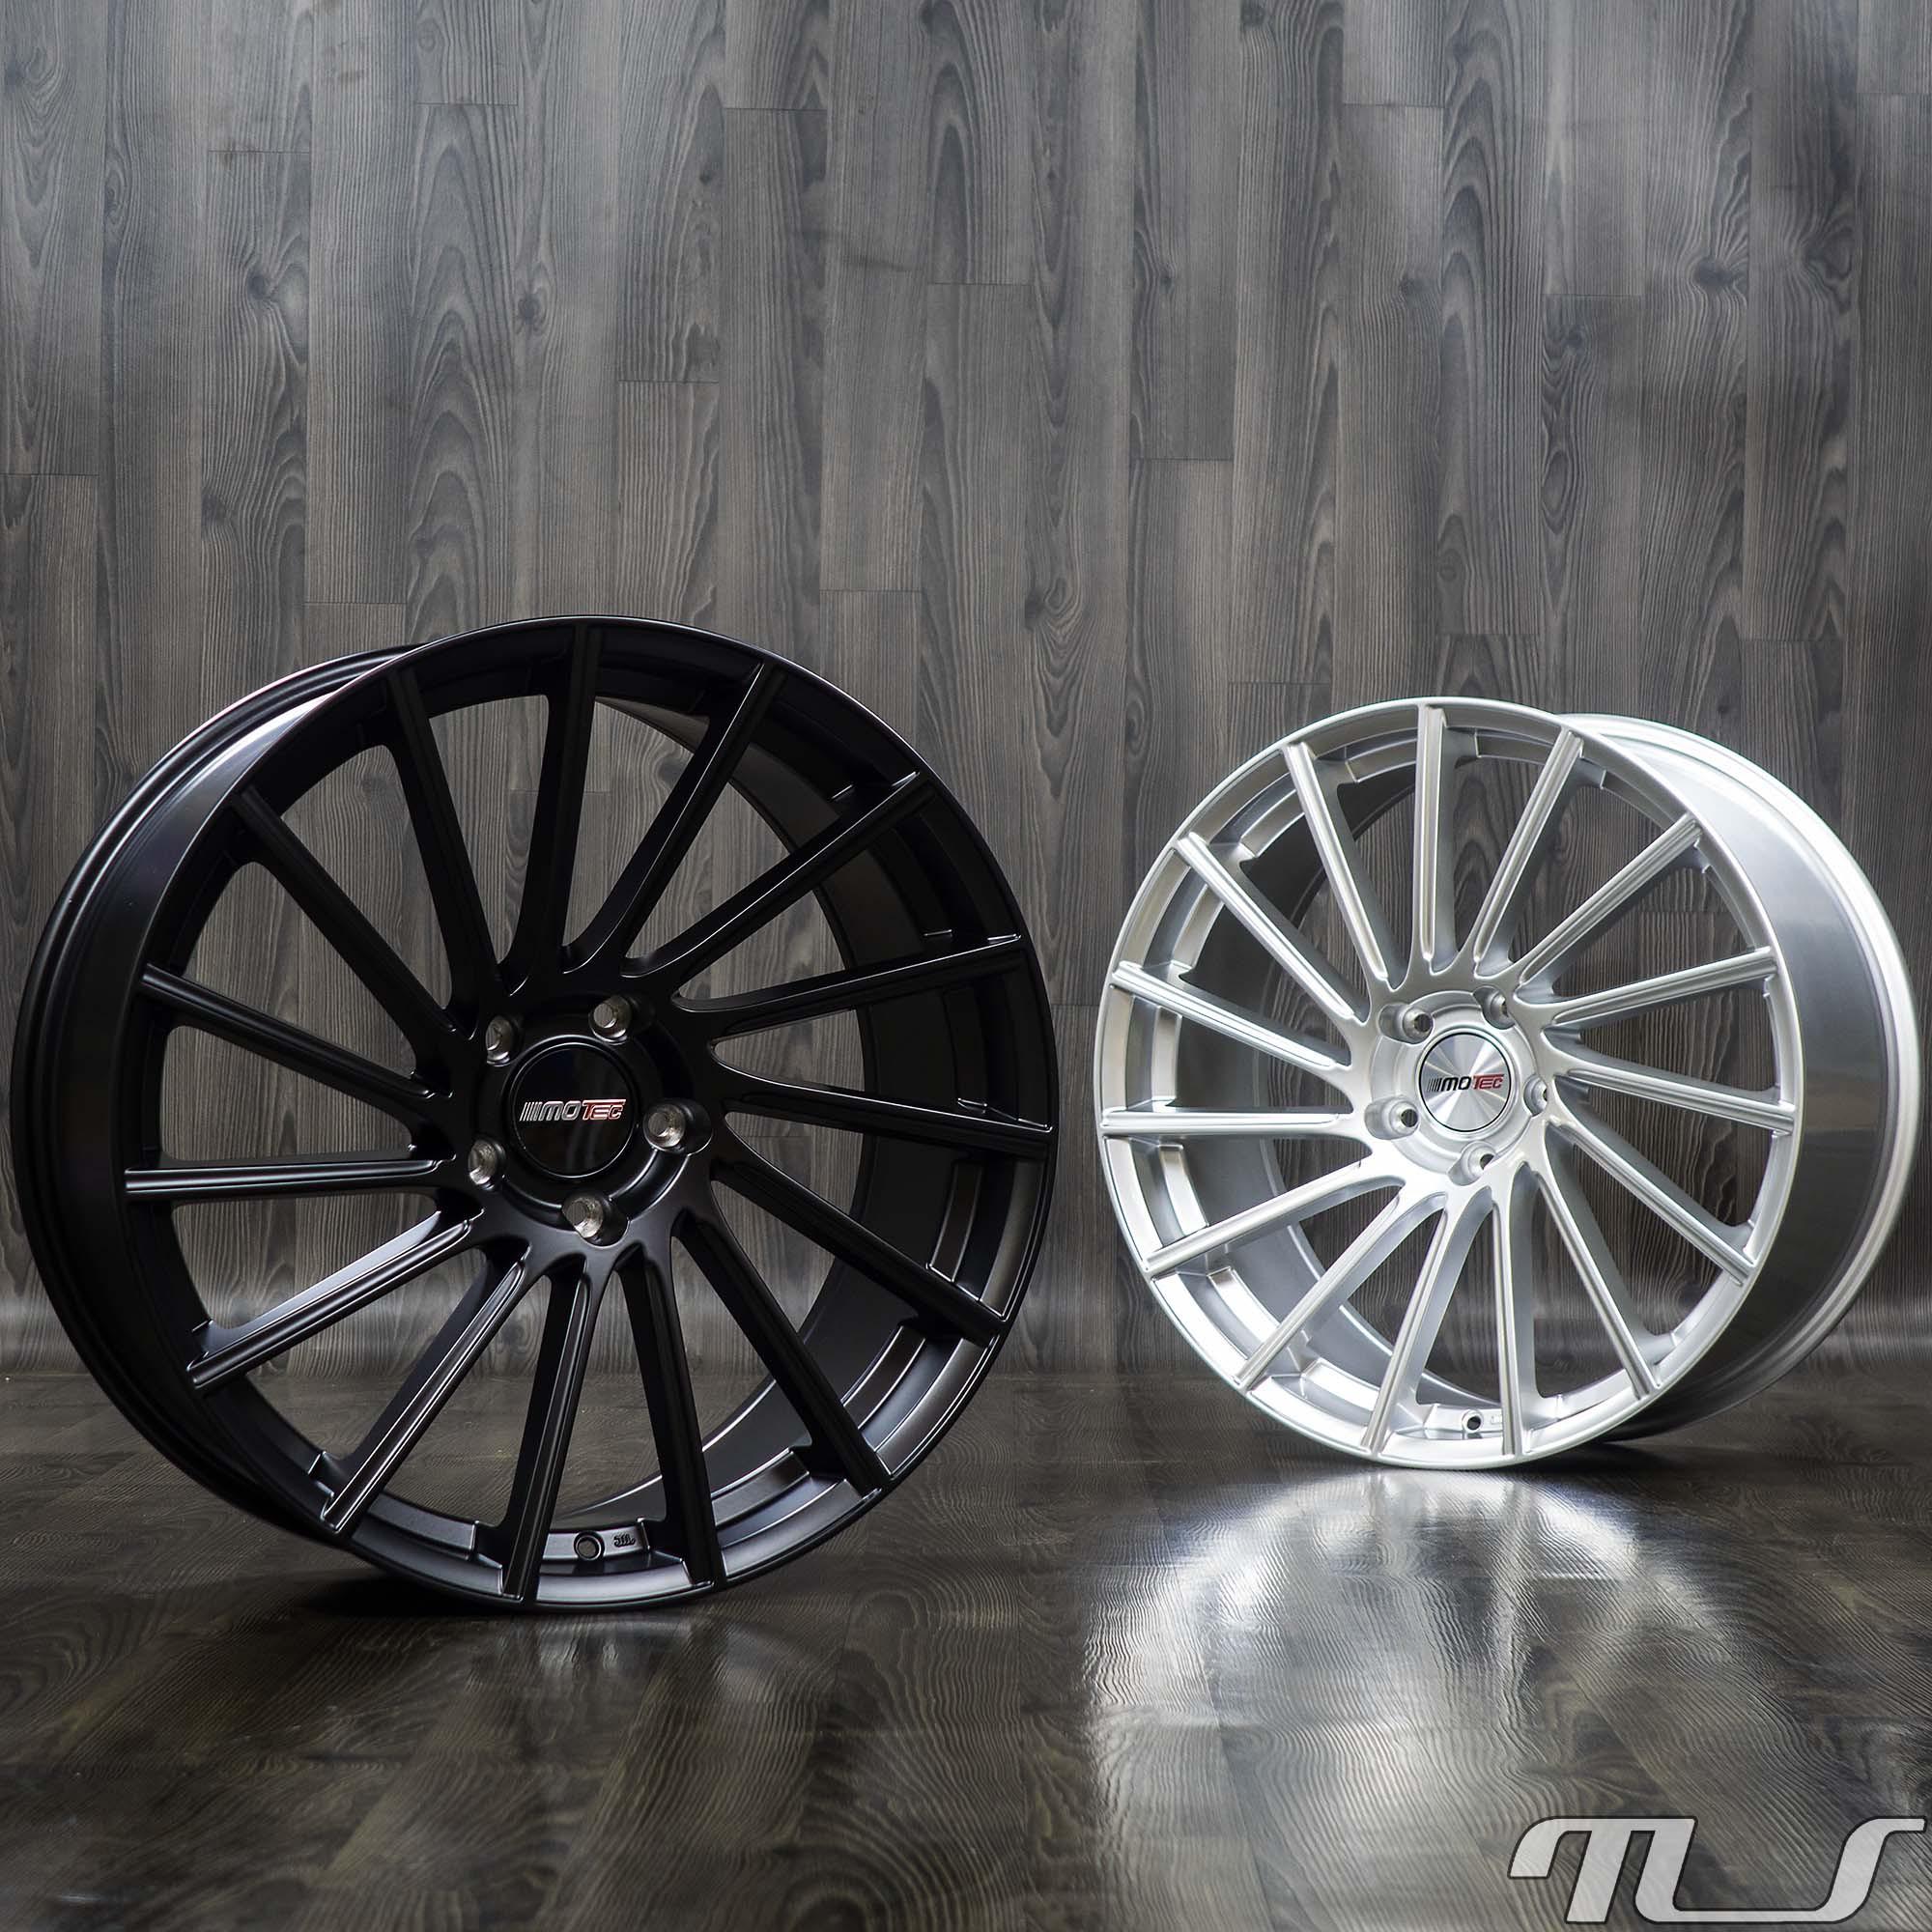 18 Inch Alloy Wheels For Vw Golf Gti Passat Cc Tiguan